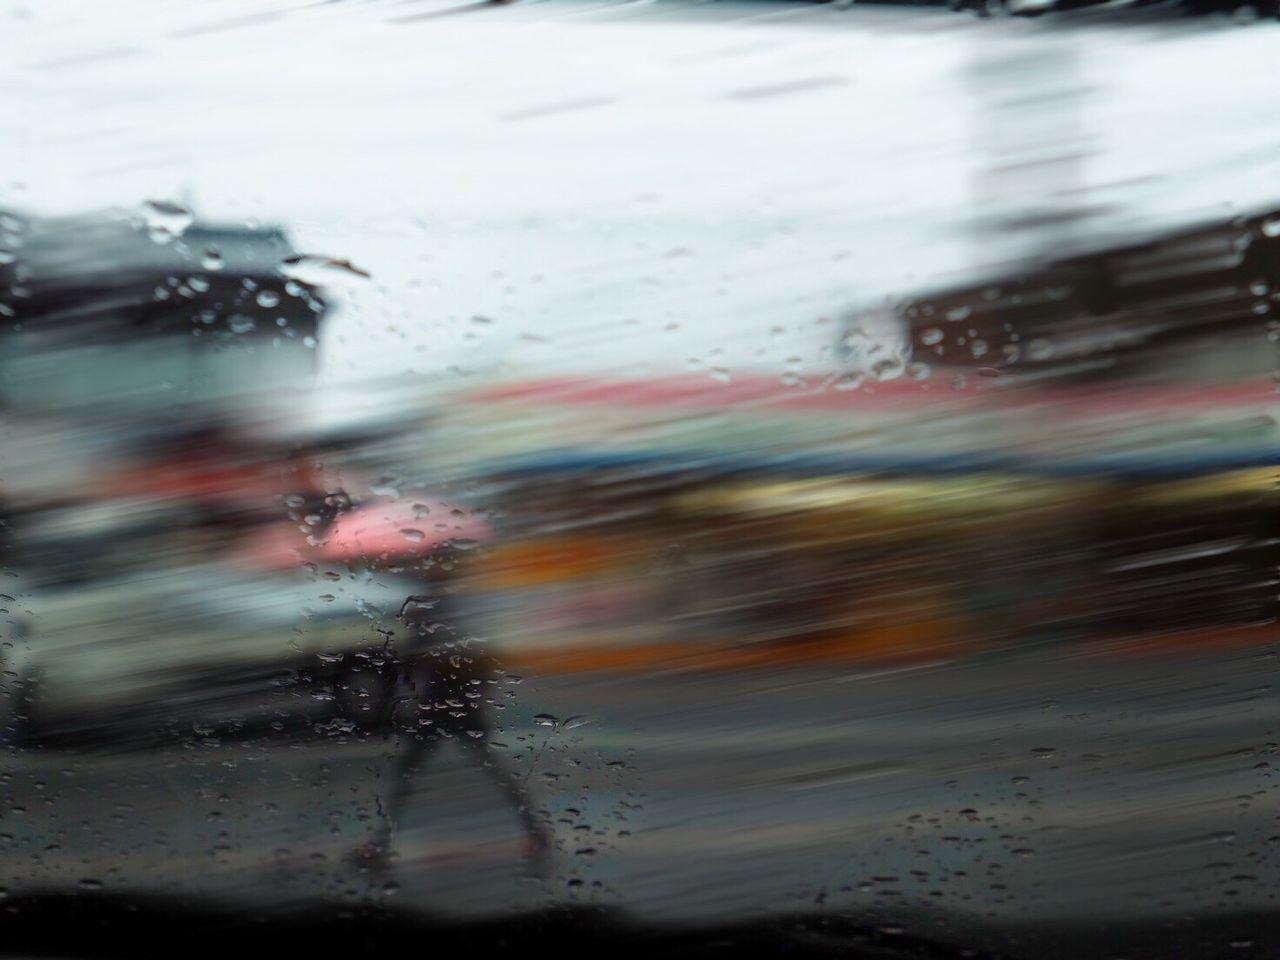 Blurred Motion Japan People Watching Street Photography Walking Railing RainyDay Fujifilm FUJIFILM X-T1